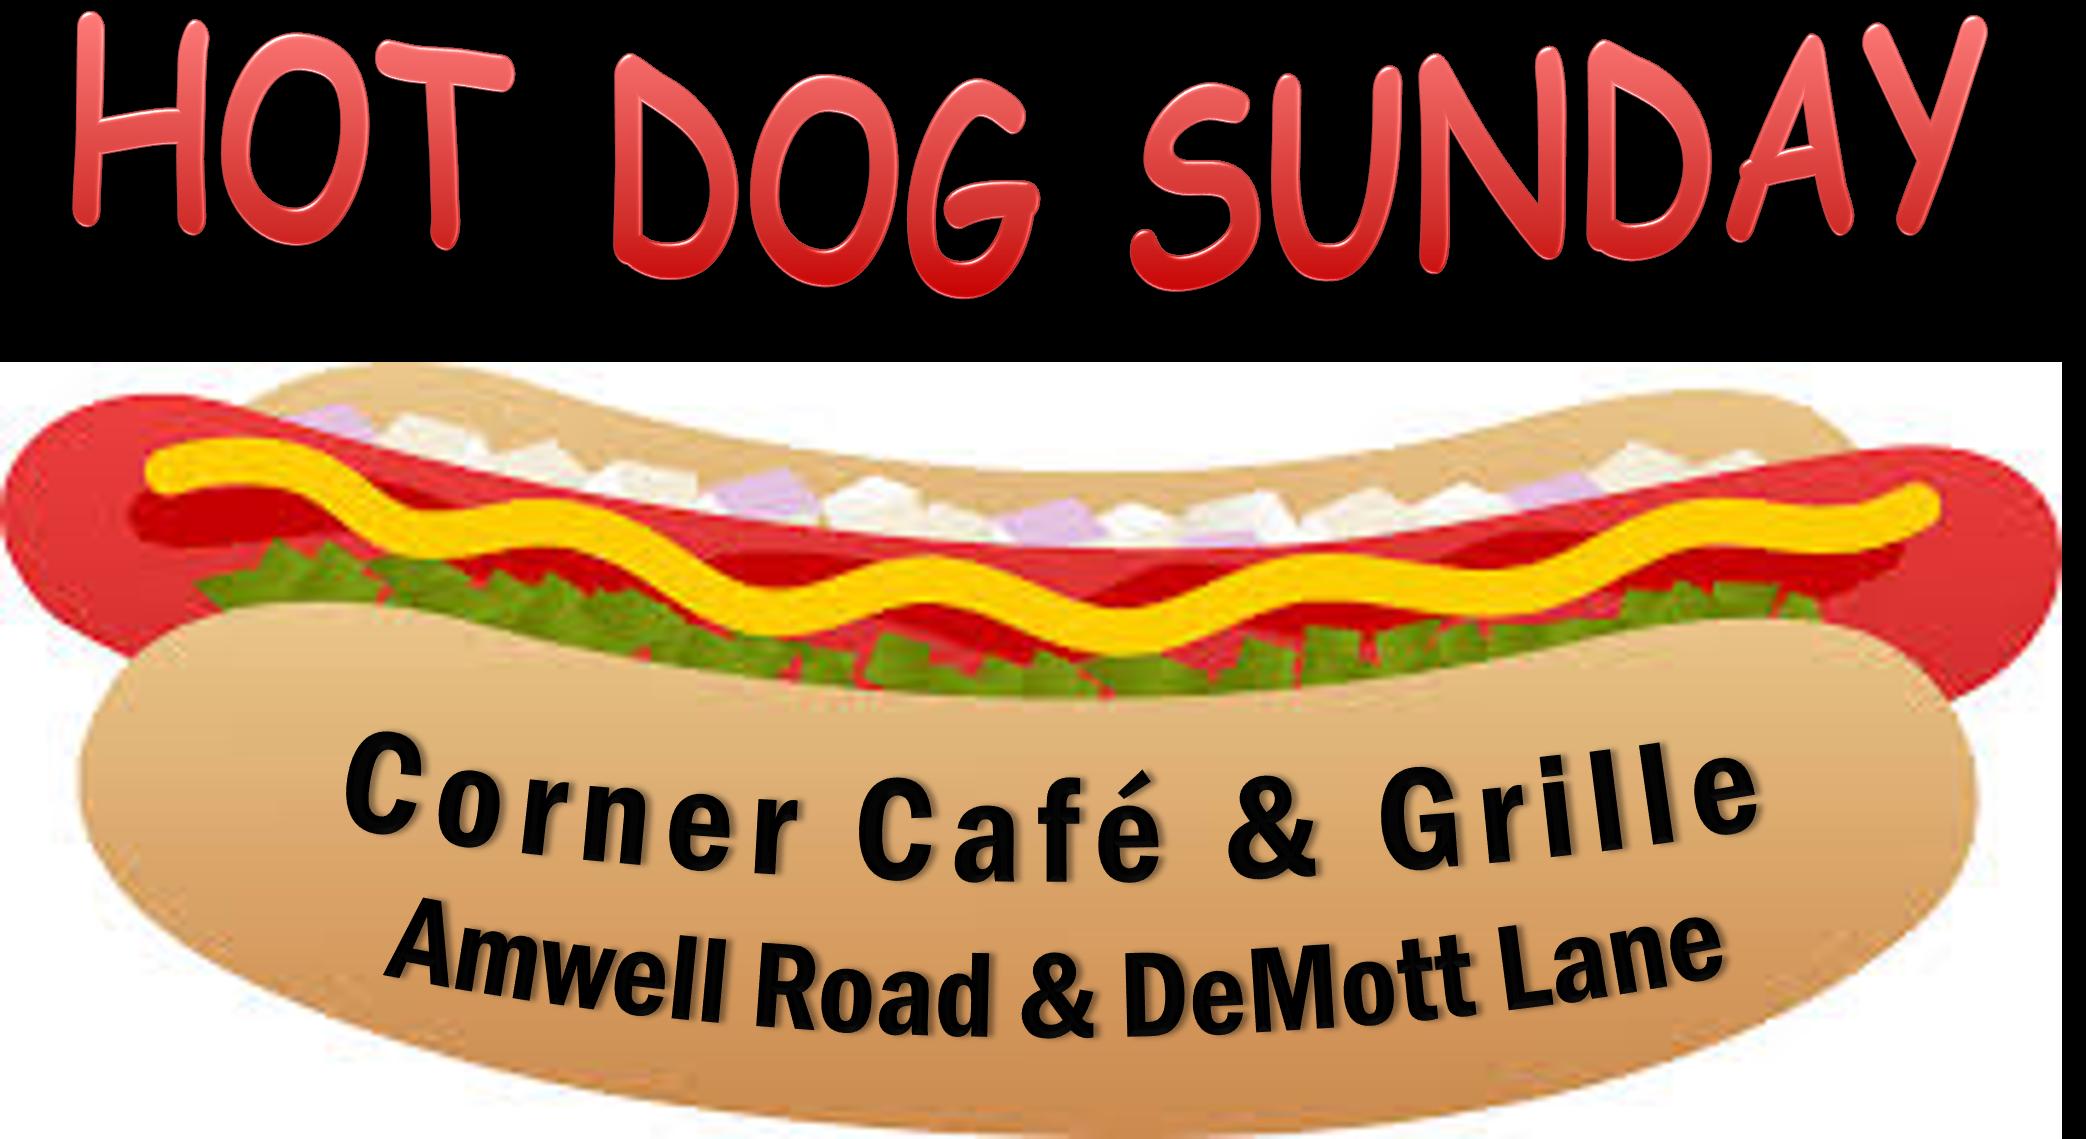 0de186752386fc9cfc67_hot-dog-sunday.jpg